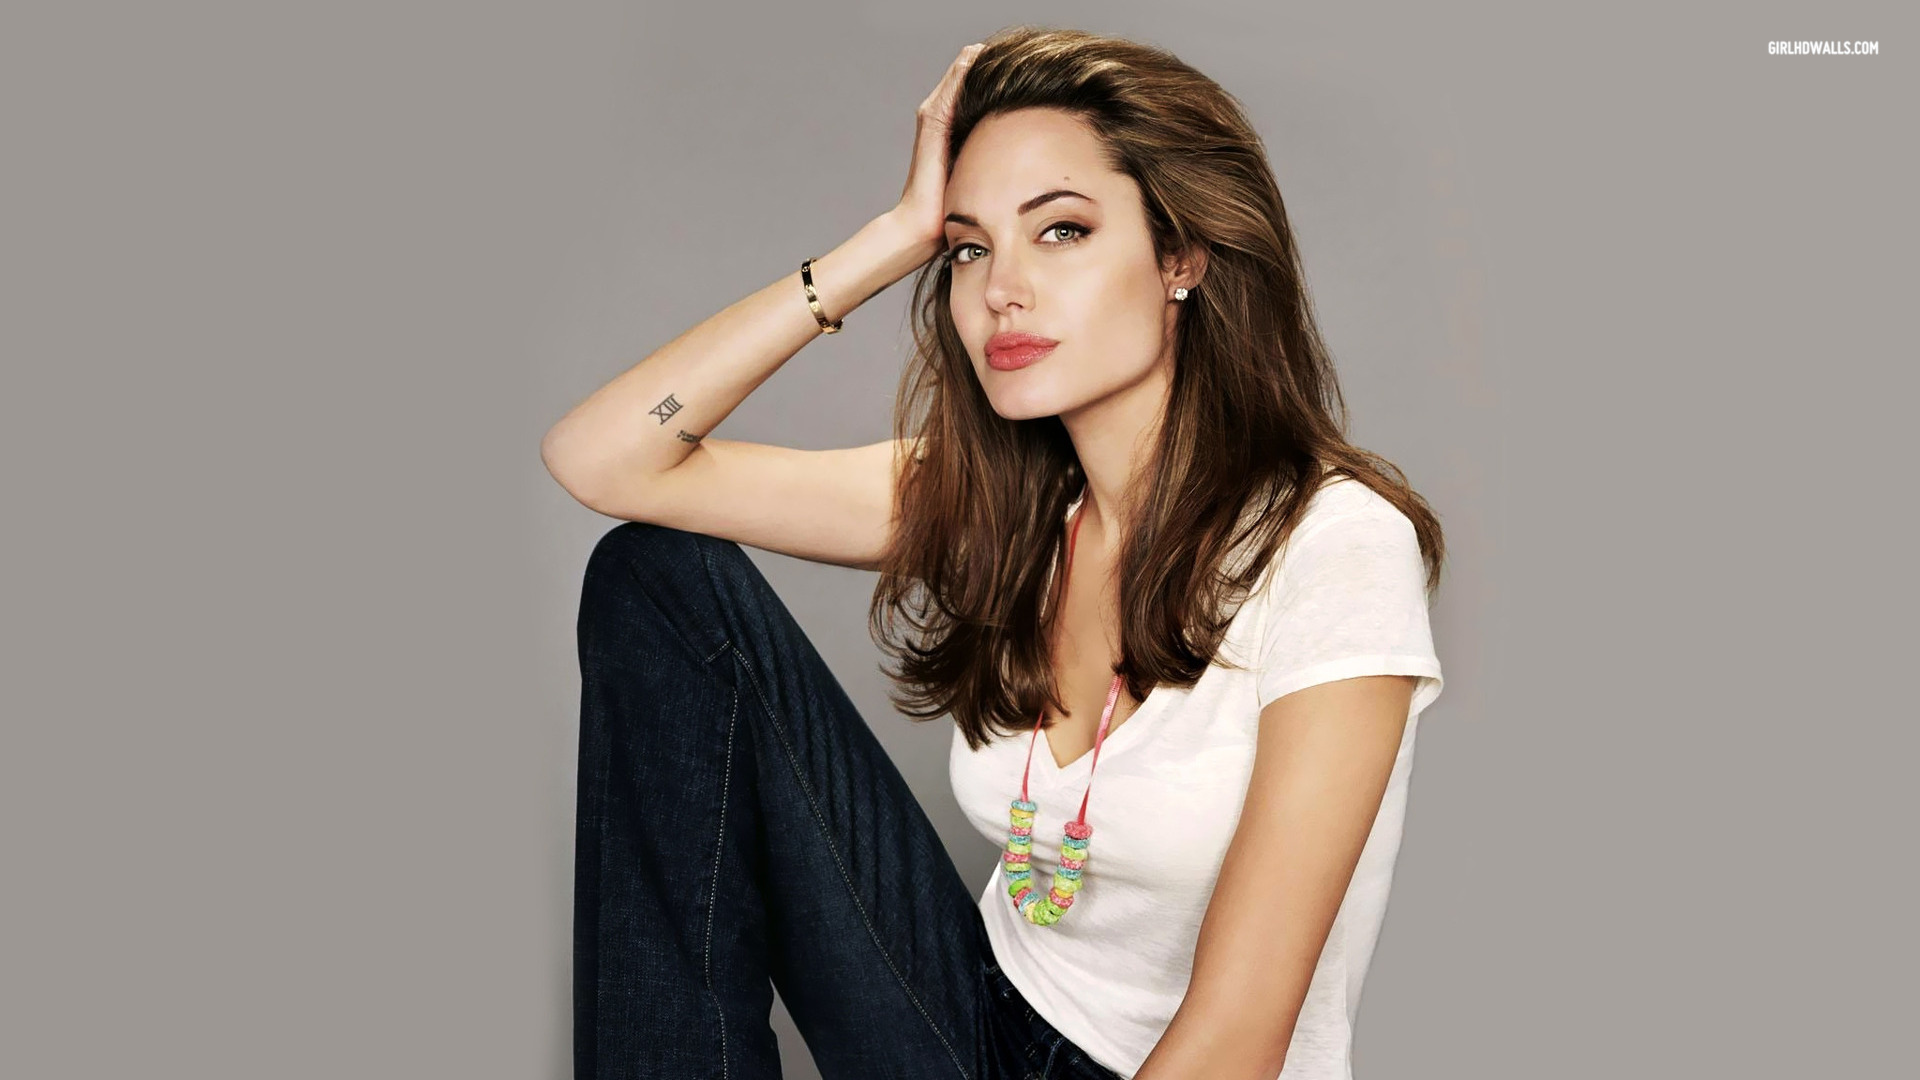 Angelina Jolie HD WallpaperImagesPics HD Wallpapers Blog